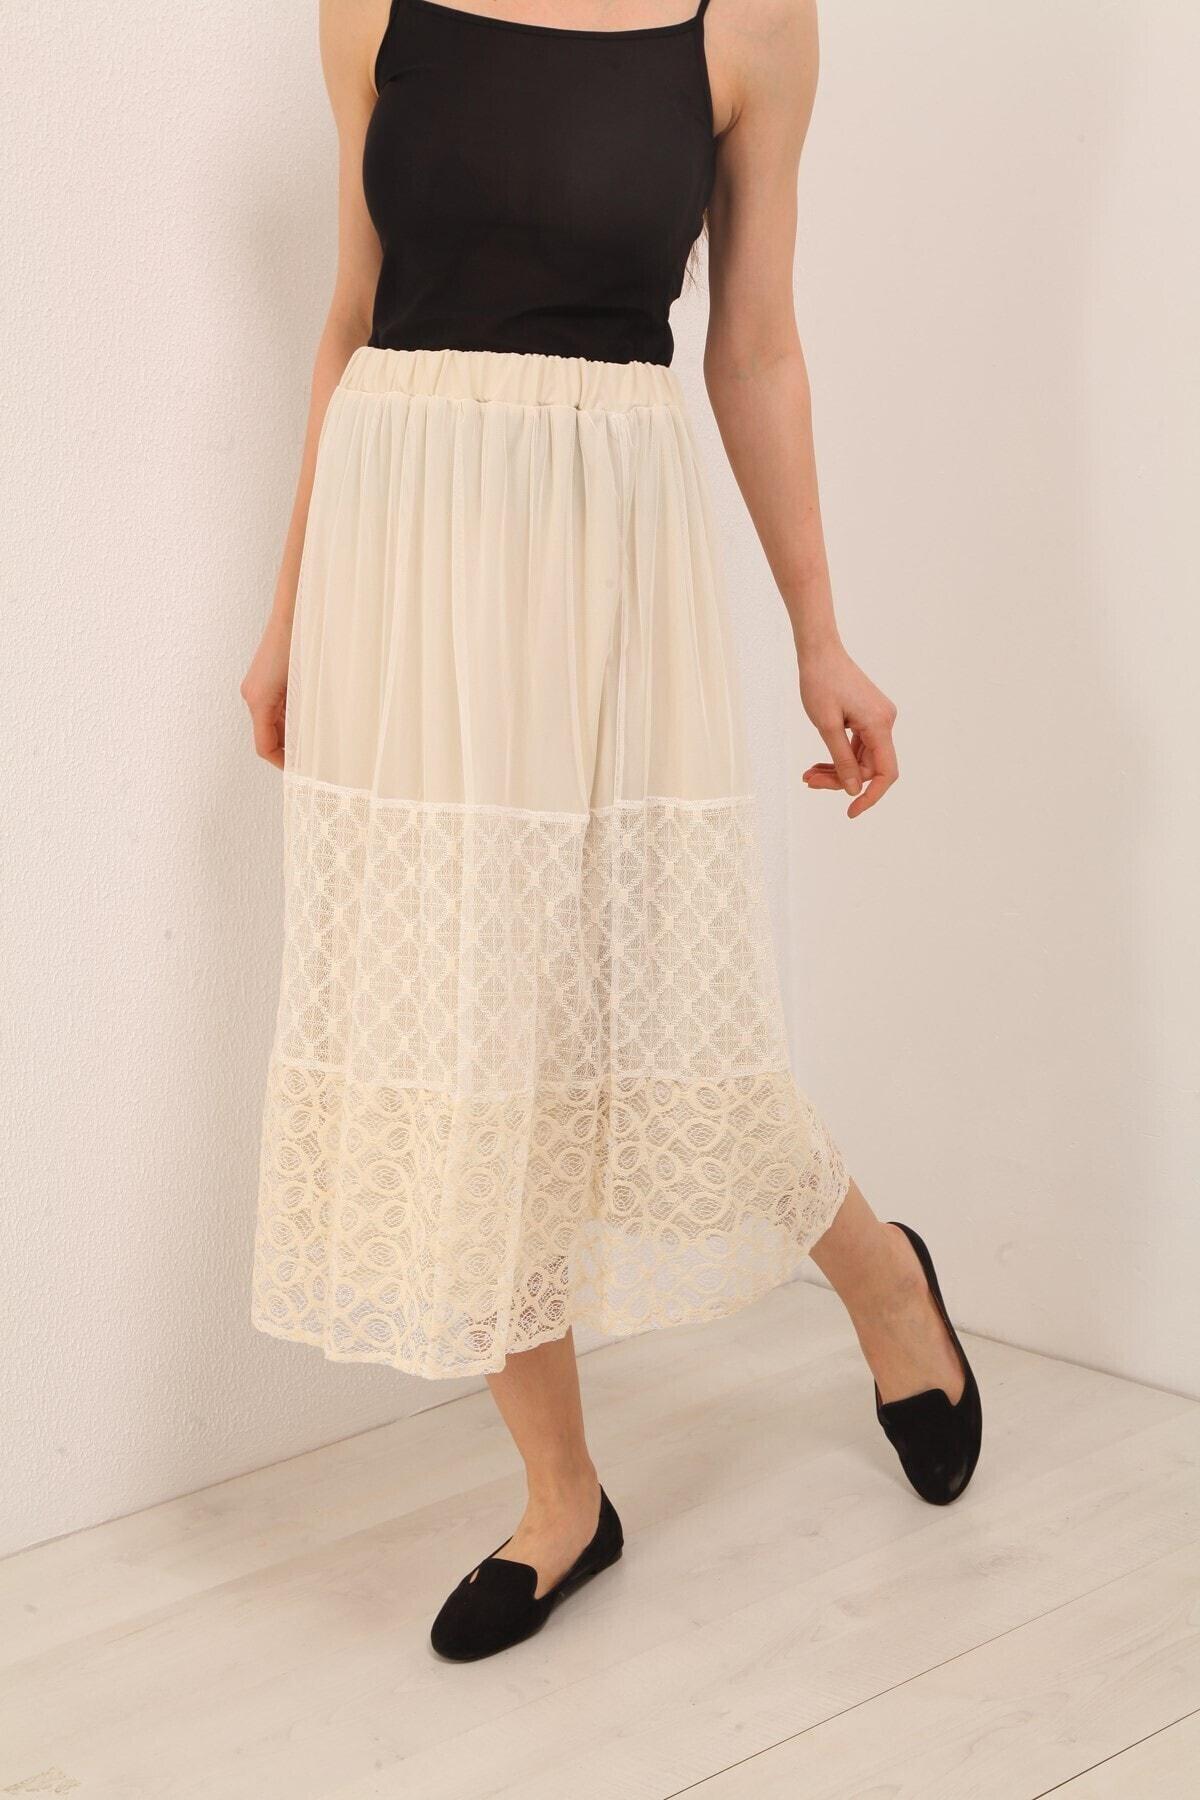 Women's Beige Old Lace Tulle Skirt Women Skirt Fashion Casual Sport